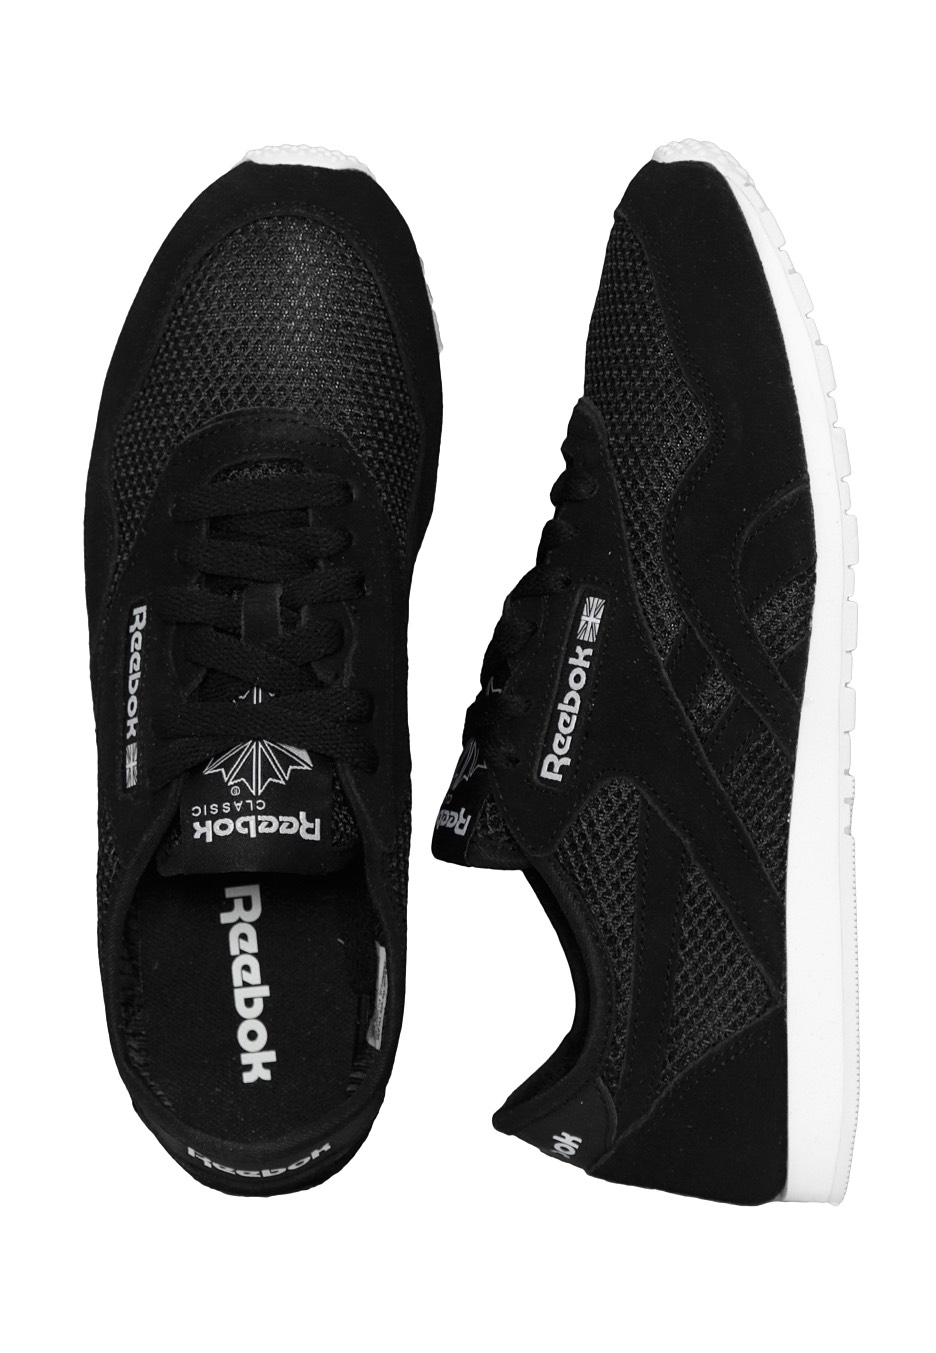 69d3ae747cd Reebok - CL Nylon Slim Mesh Black White - Girl Shoes - Impericon.com  Worldwide